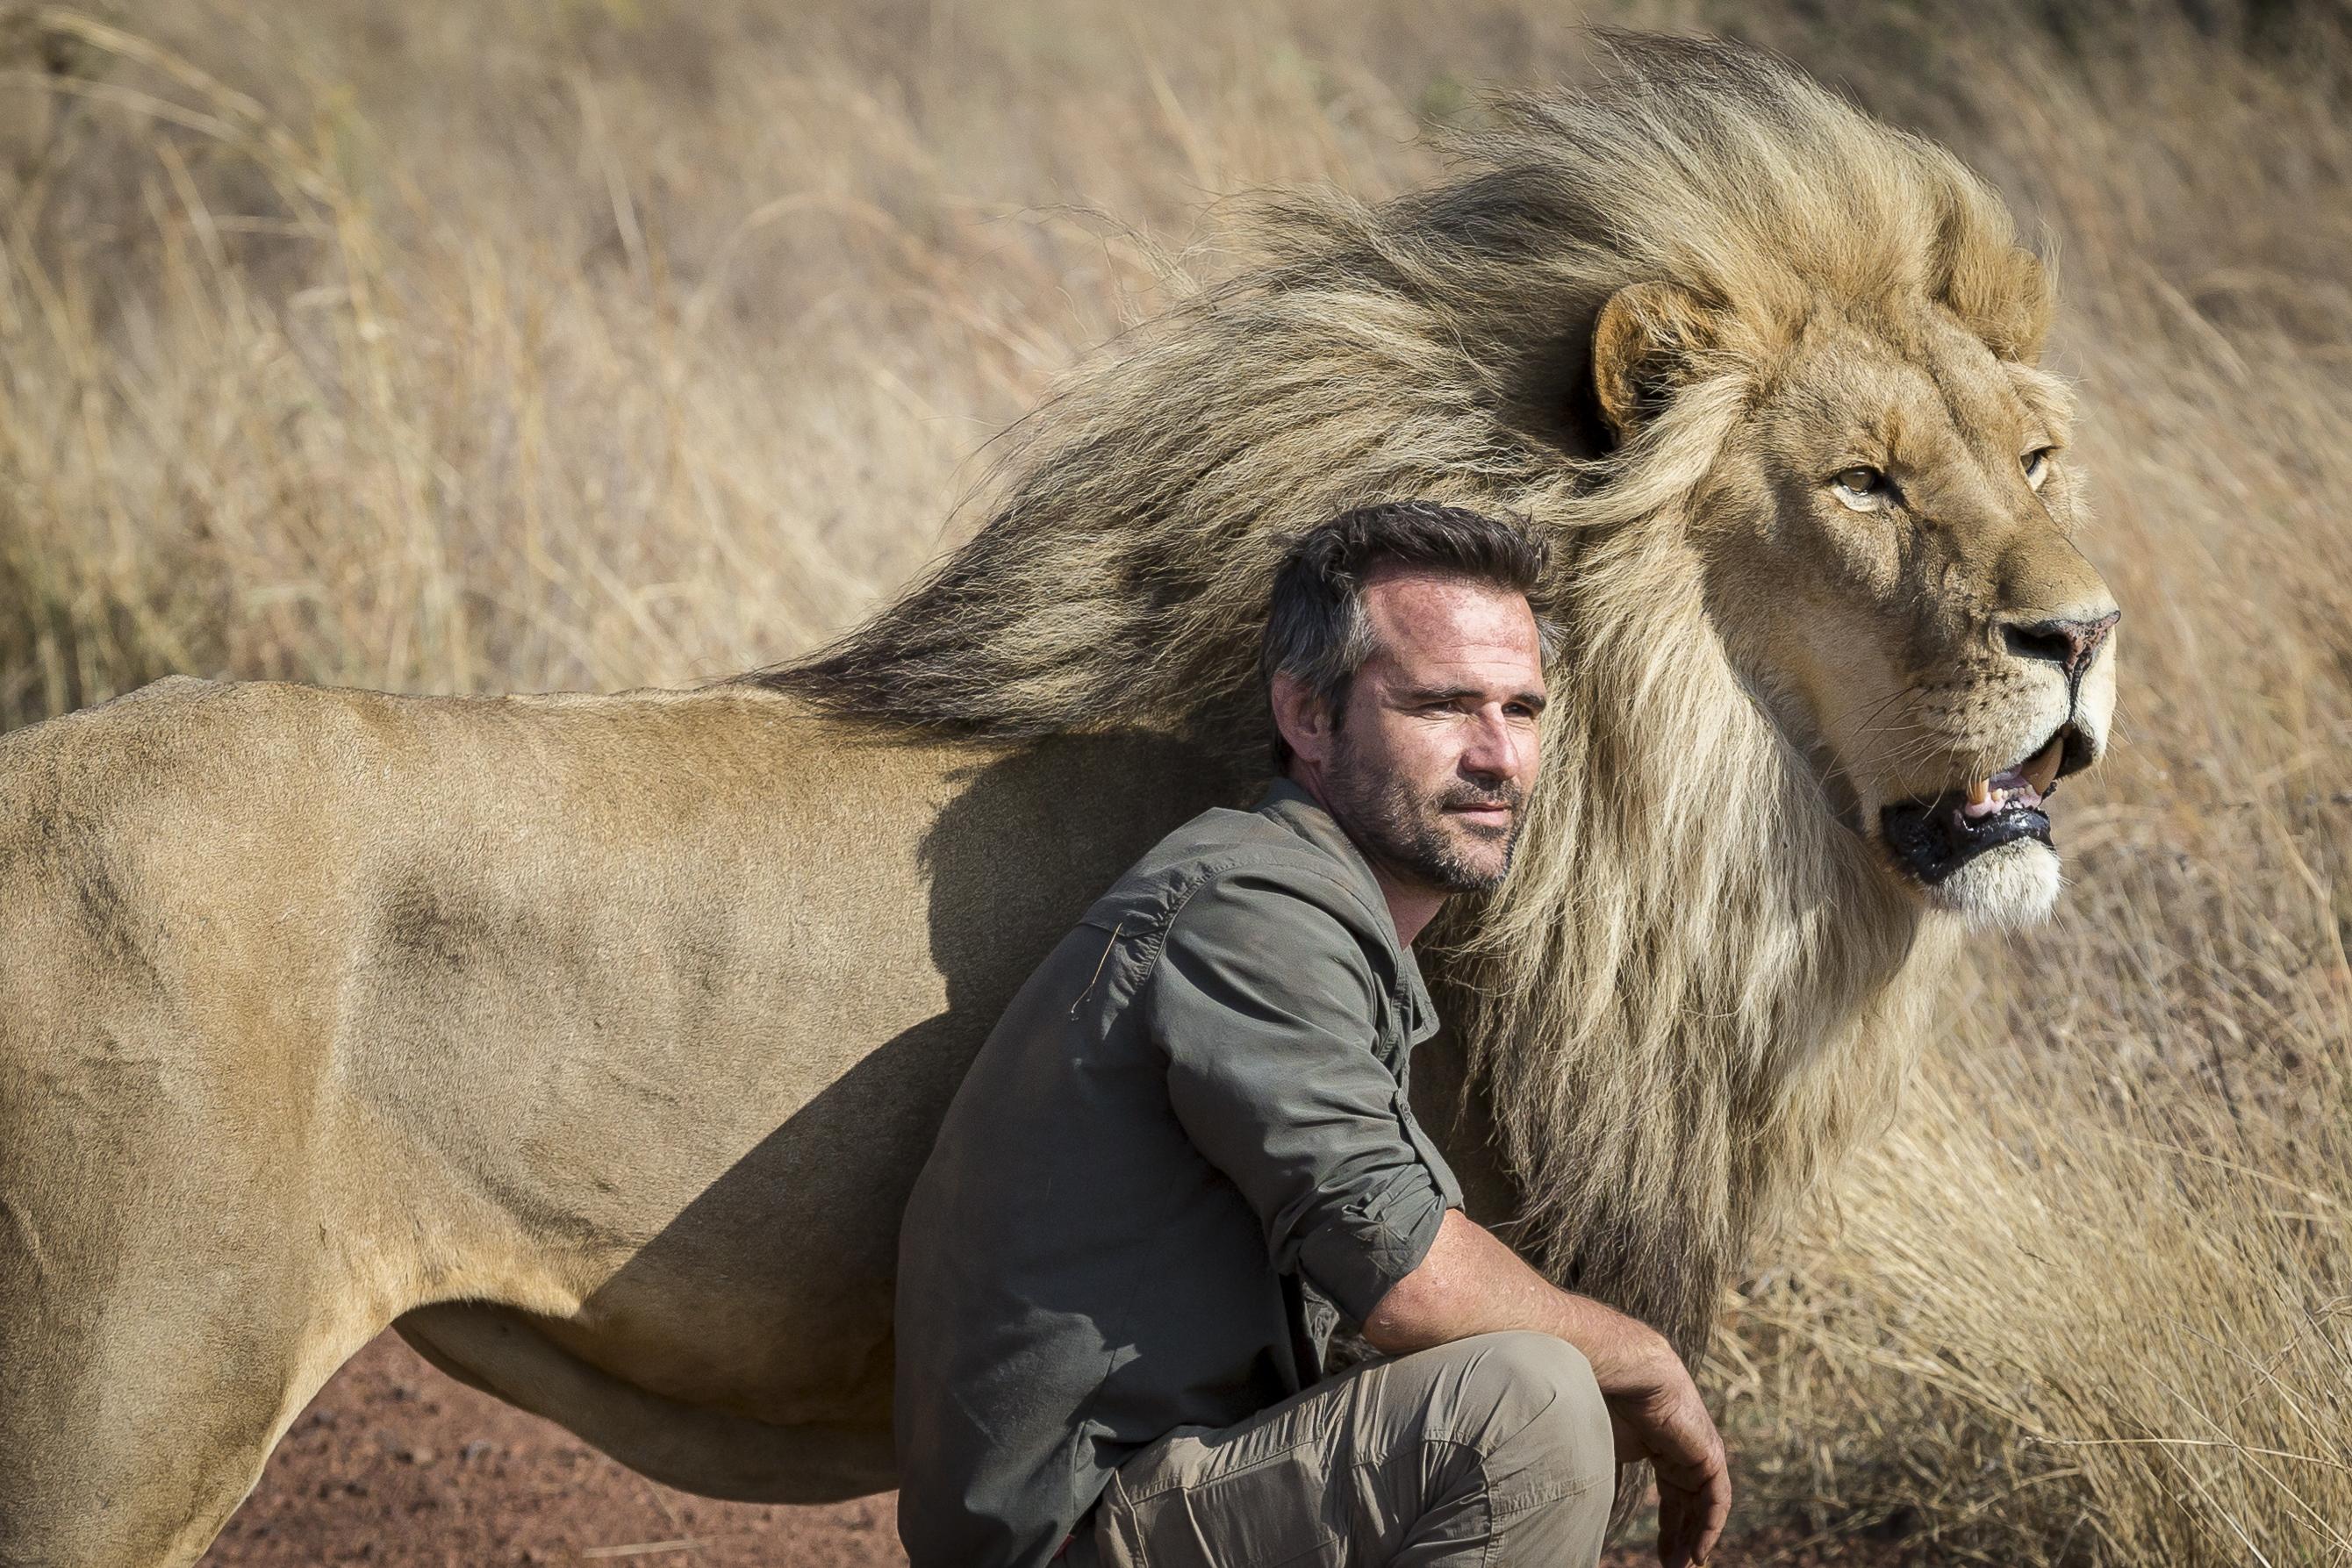 Zoologist Job Description Career as a Zoologist Salary